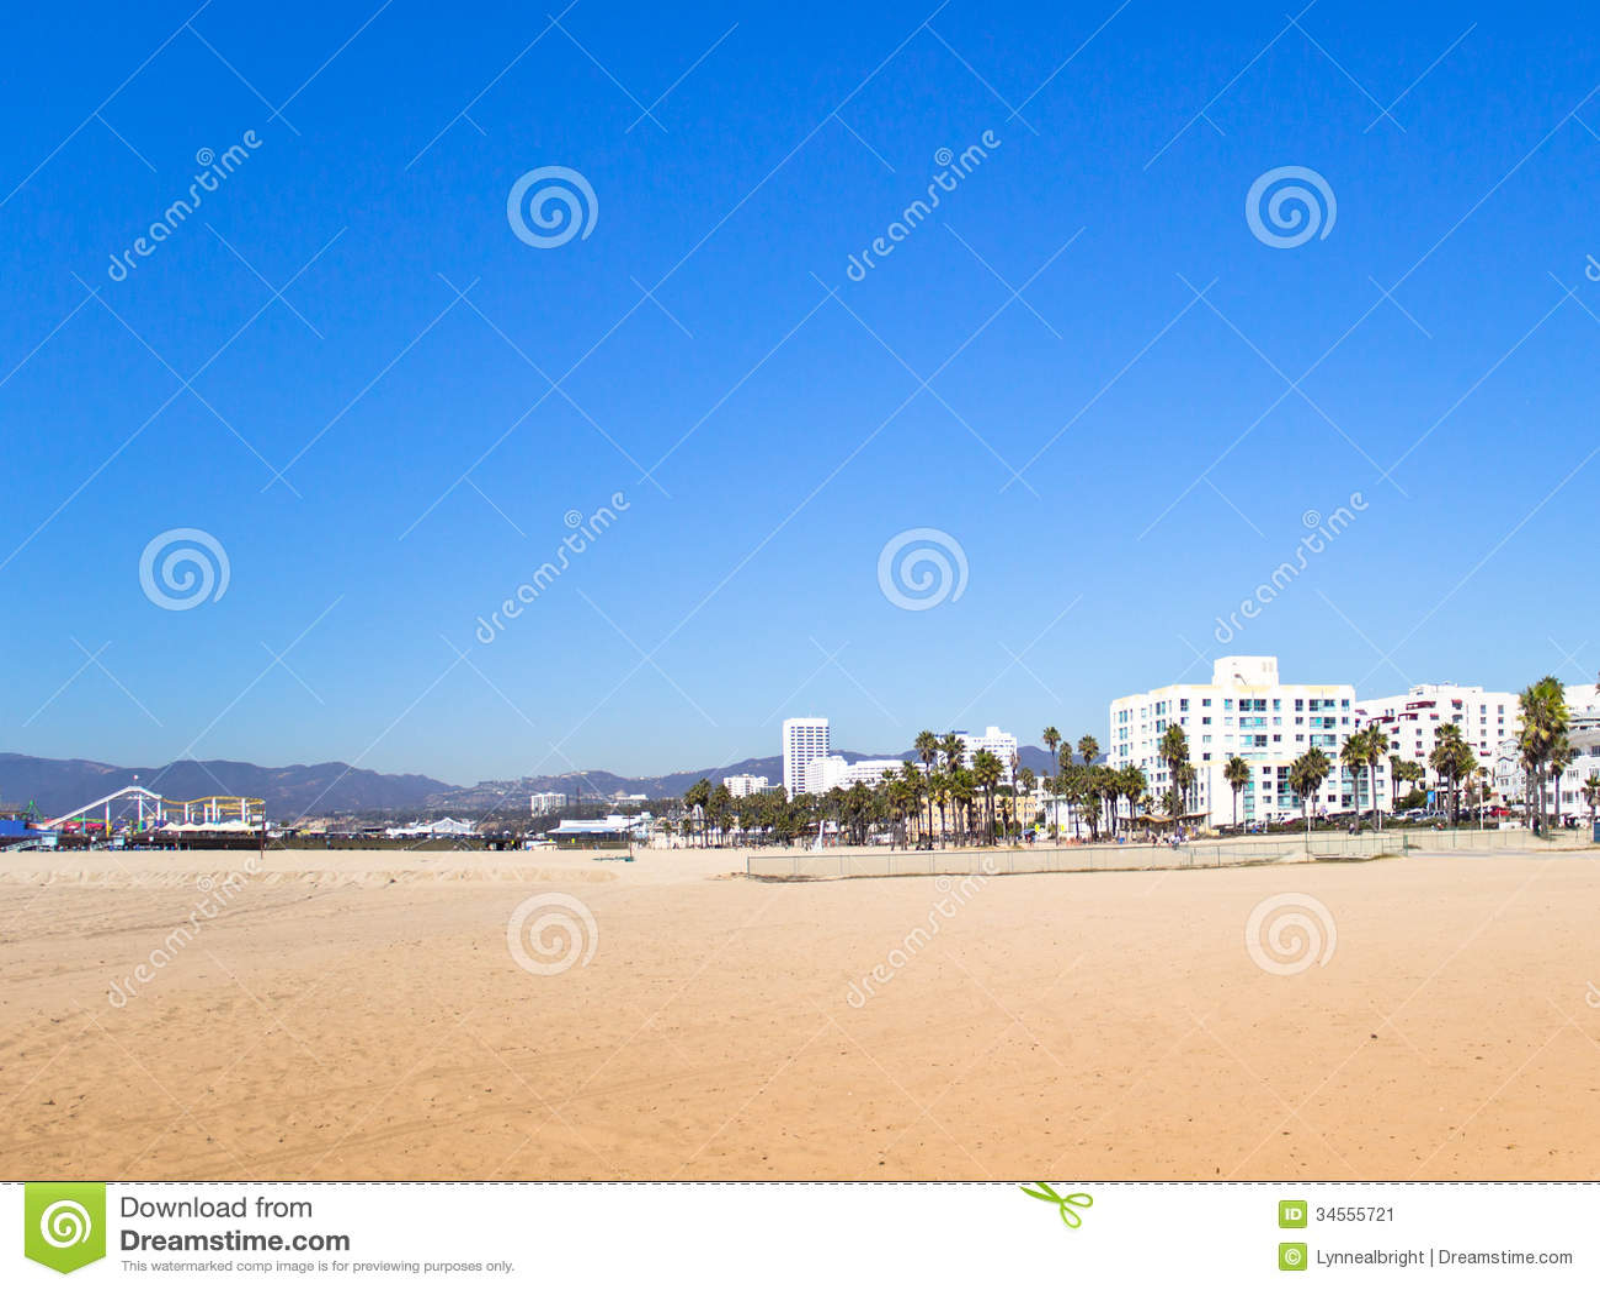 santa monica pier ca and hotels stock image image. Black Bedroom Furniture Sets. Home Design Ideas